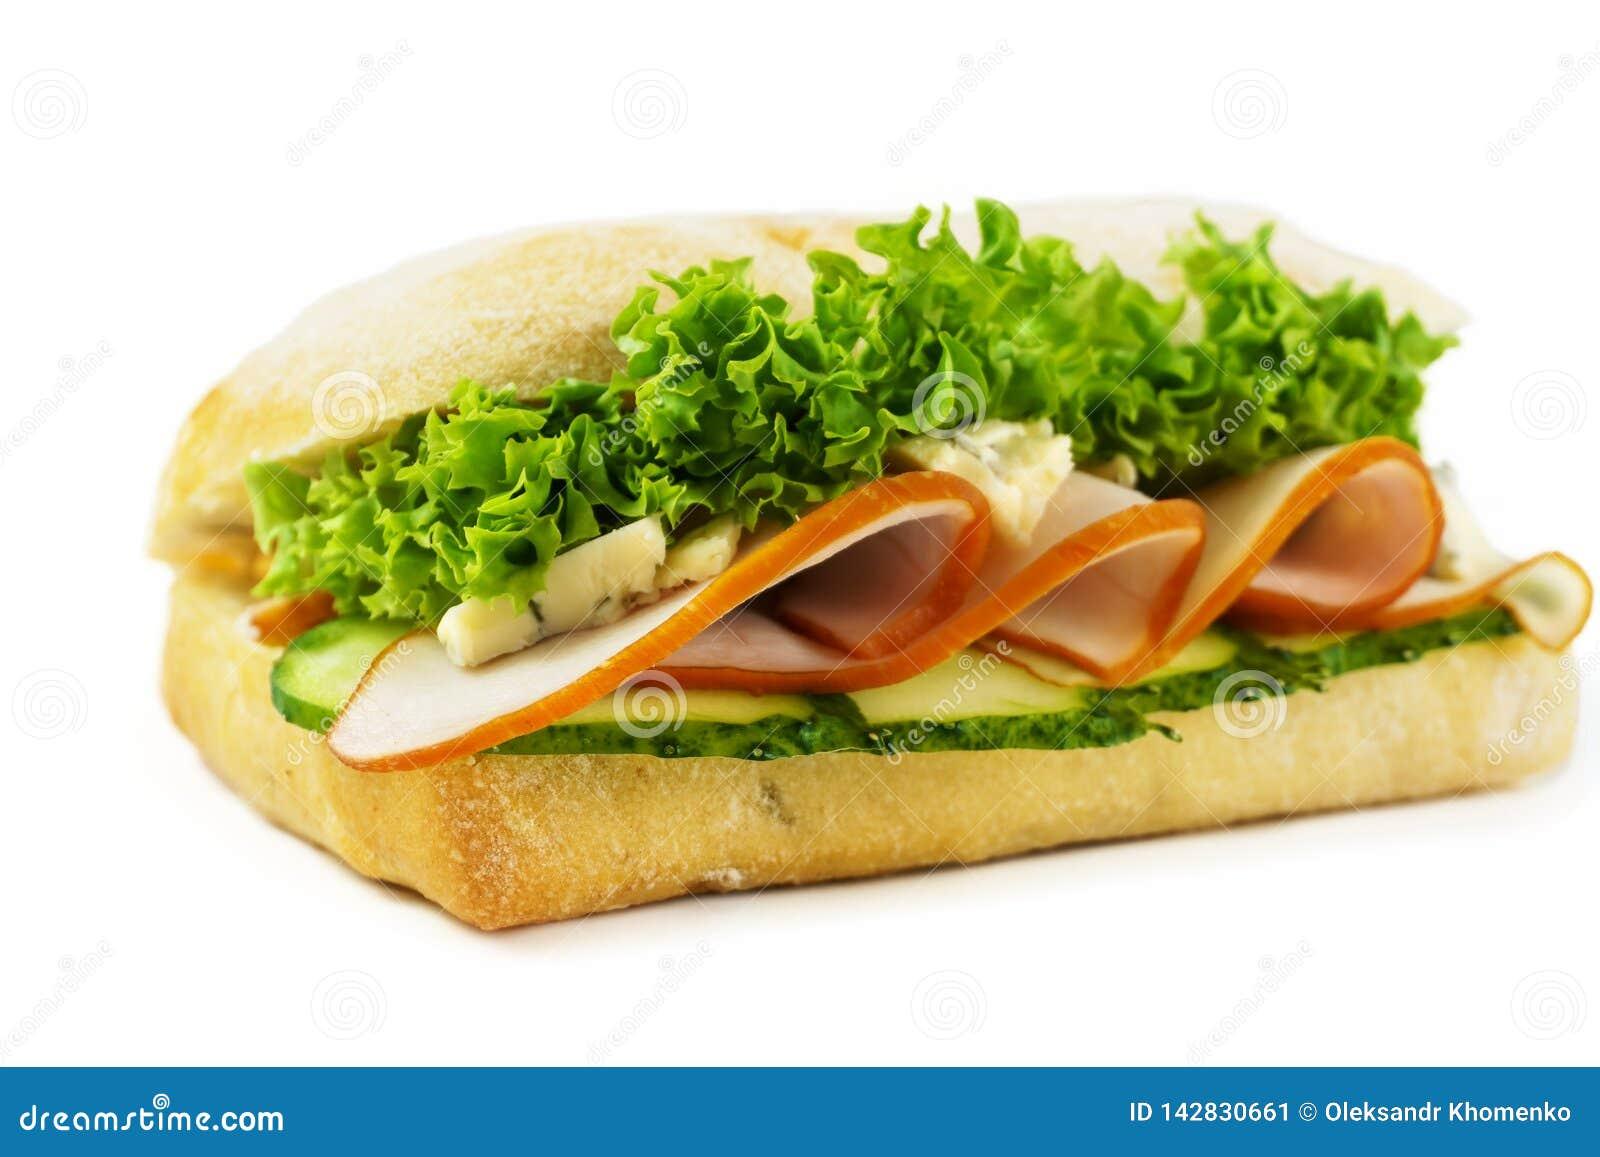 Sandwich verse sla, komkommer en hammening van hierboven